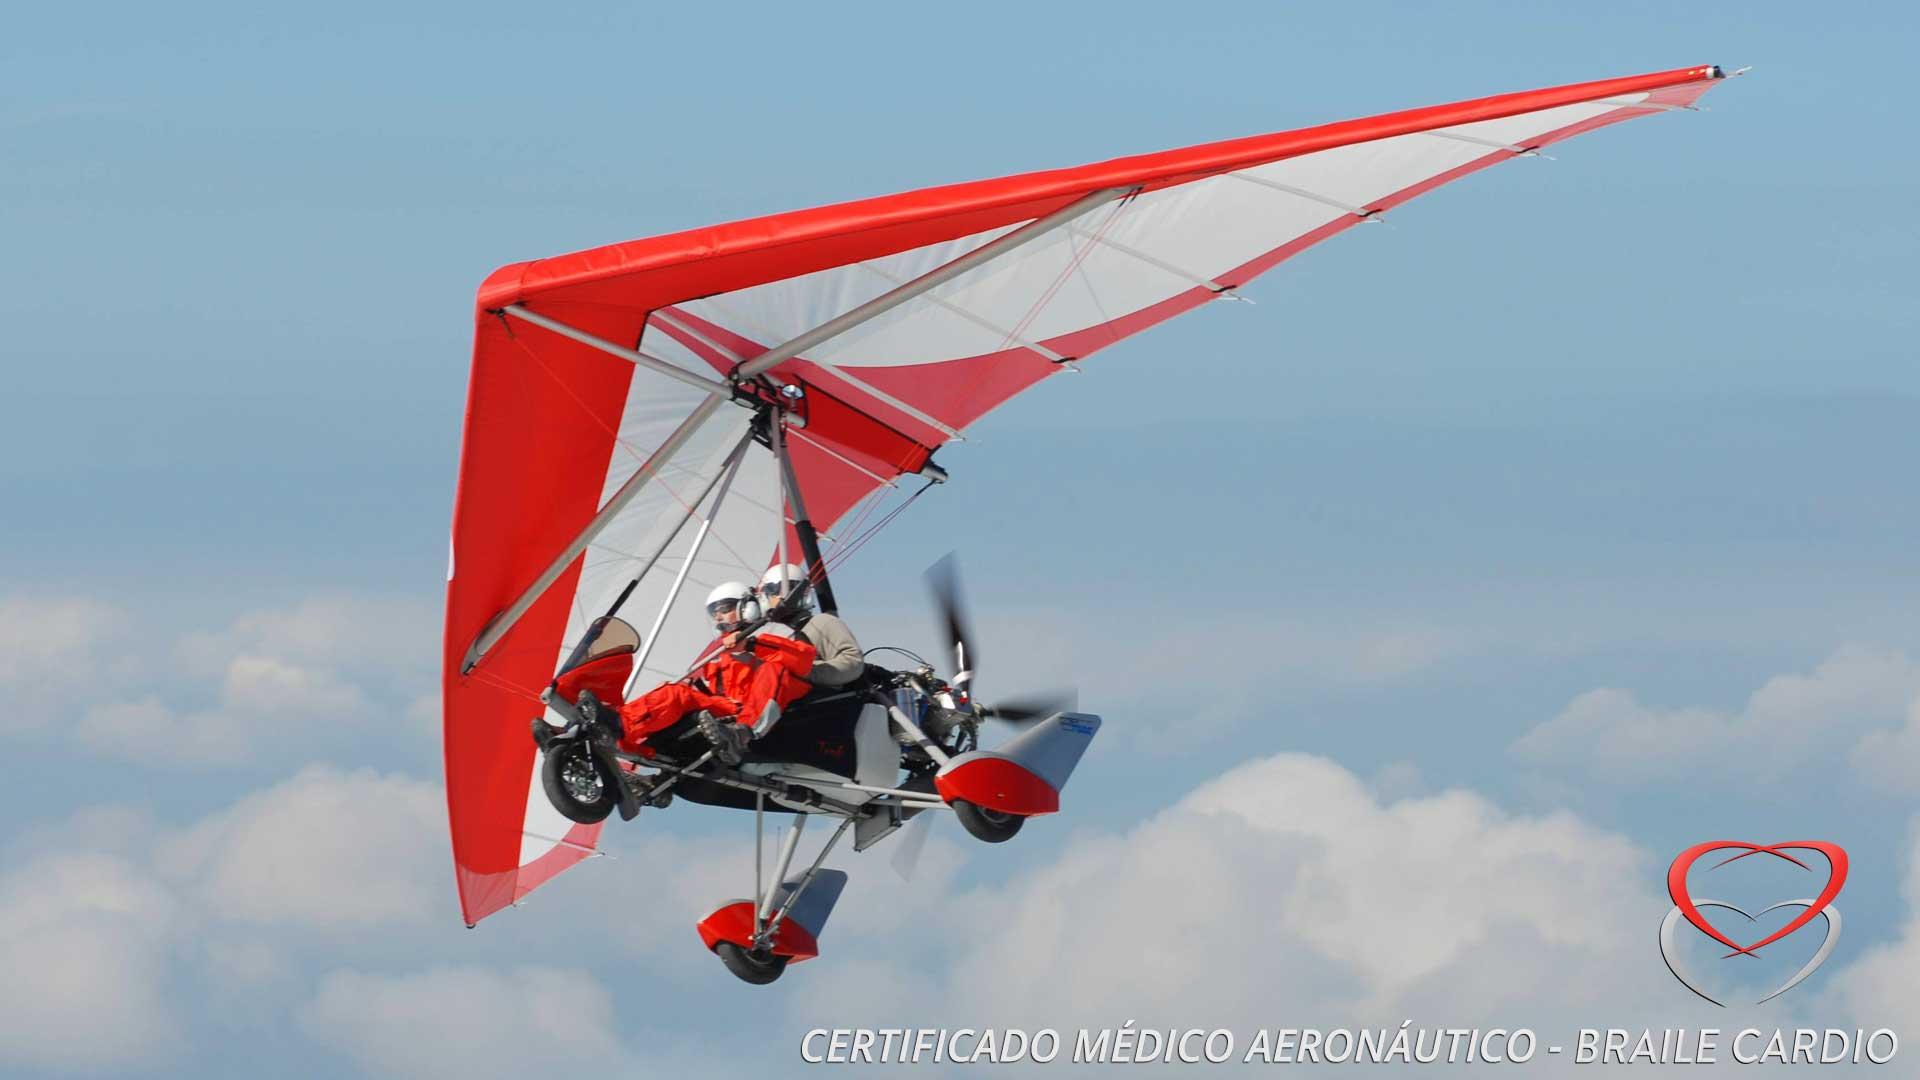 Certificado Médico Aeronáutico – Piloto Aerodesportivo